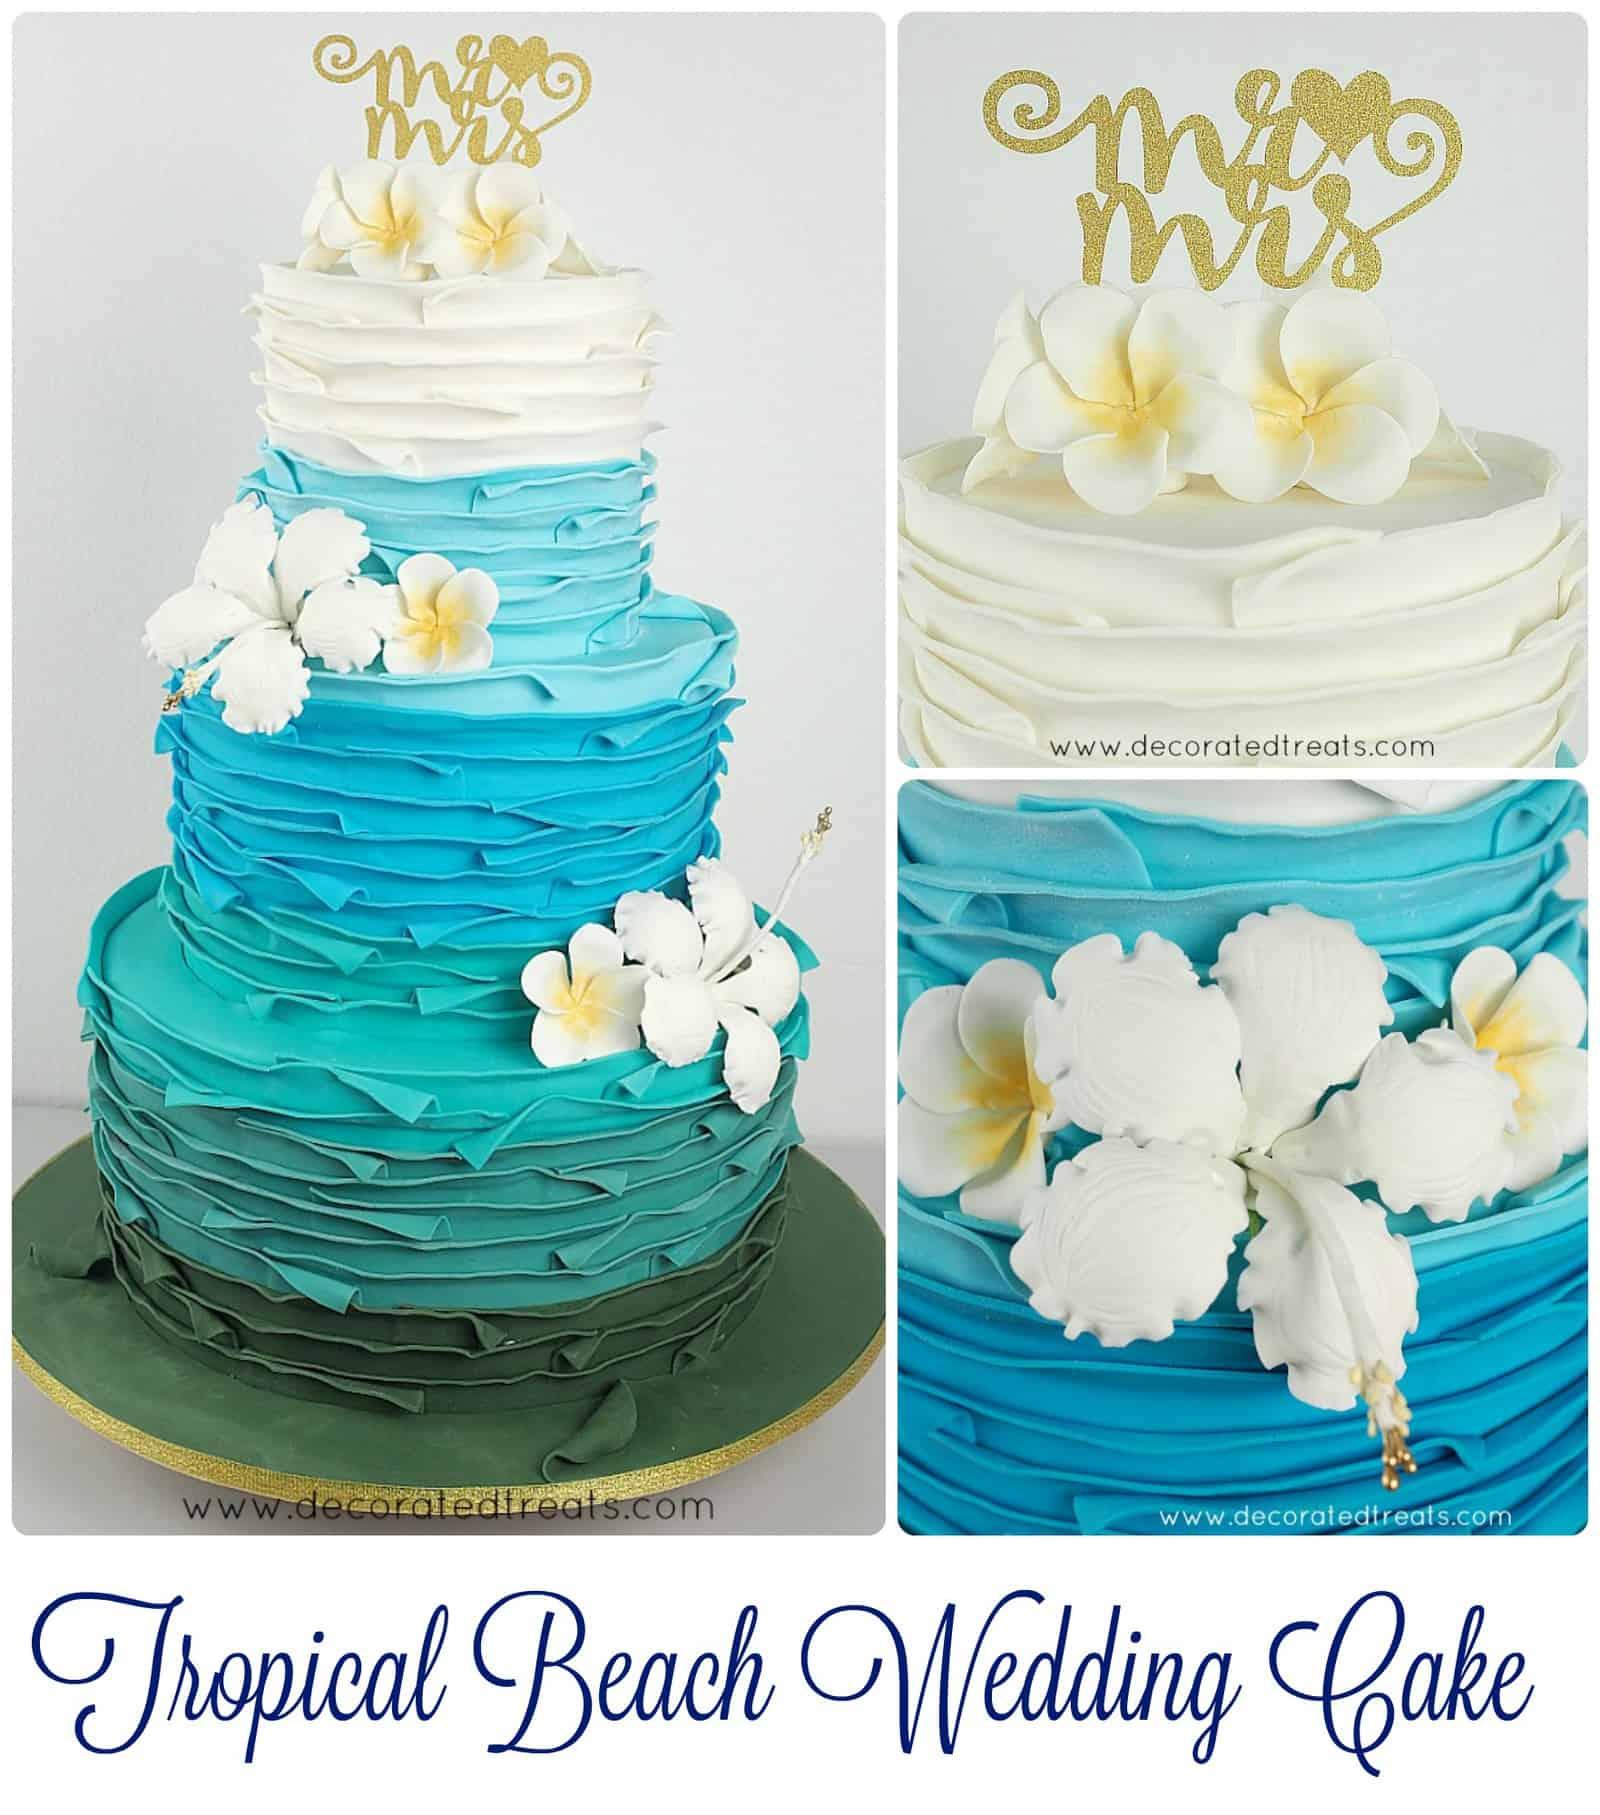 Poster for tropical beach wedding cake